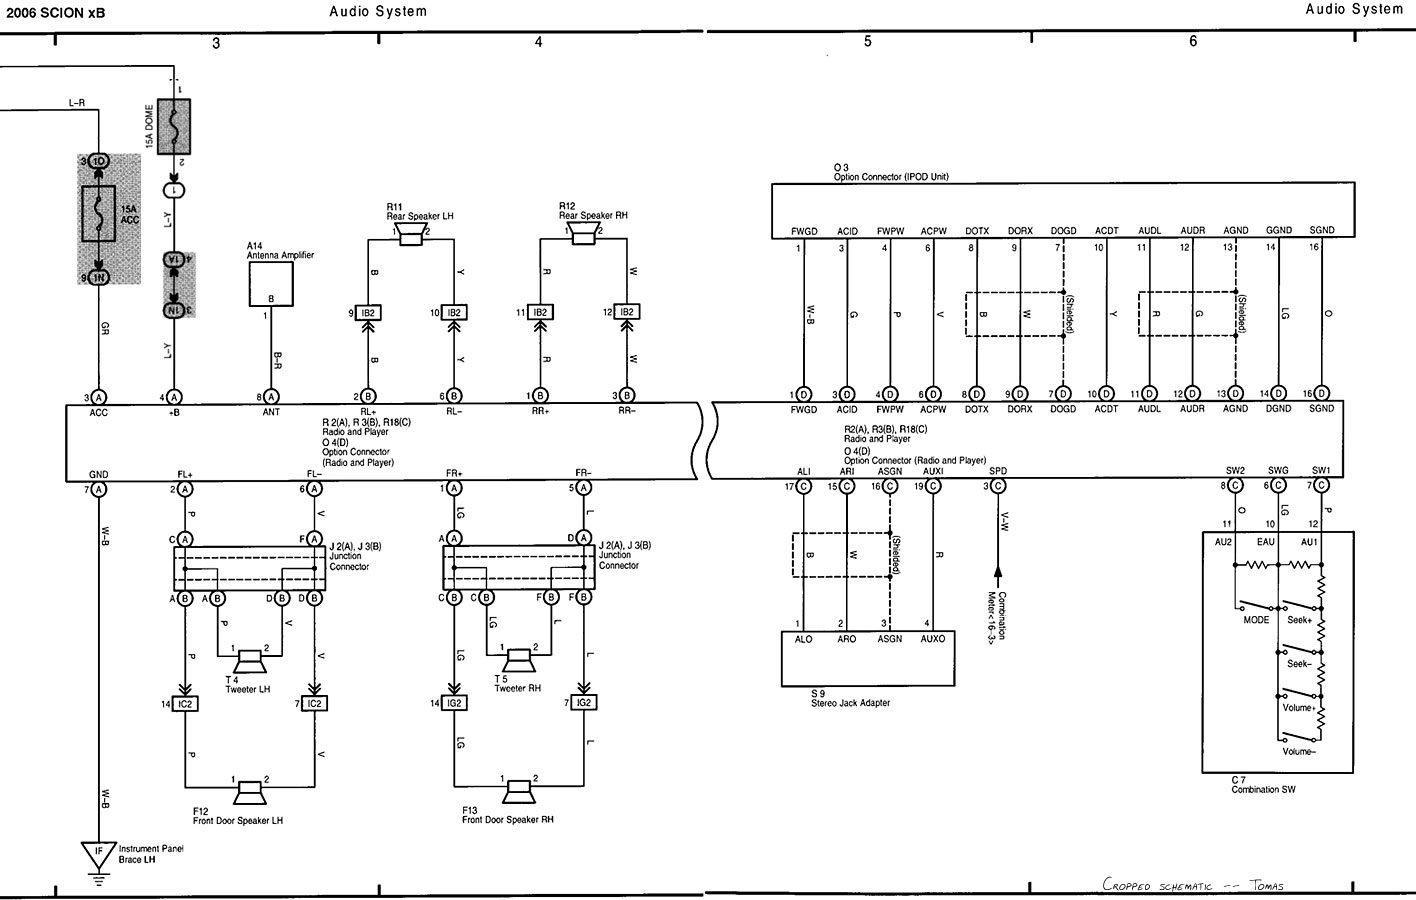 2012 KIA Forte Stereo Wiring Diagram Library. Scion Xb Wiring Diagram Circuit \u2022 KIA Optima Stereo For 2009 2012. KIA. KIA Optima Stereo Wiring Diagram At Scoala.co